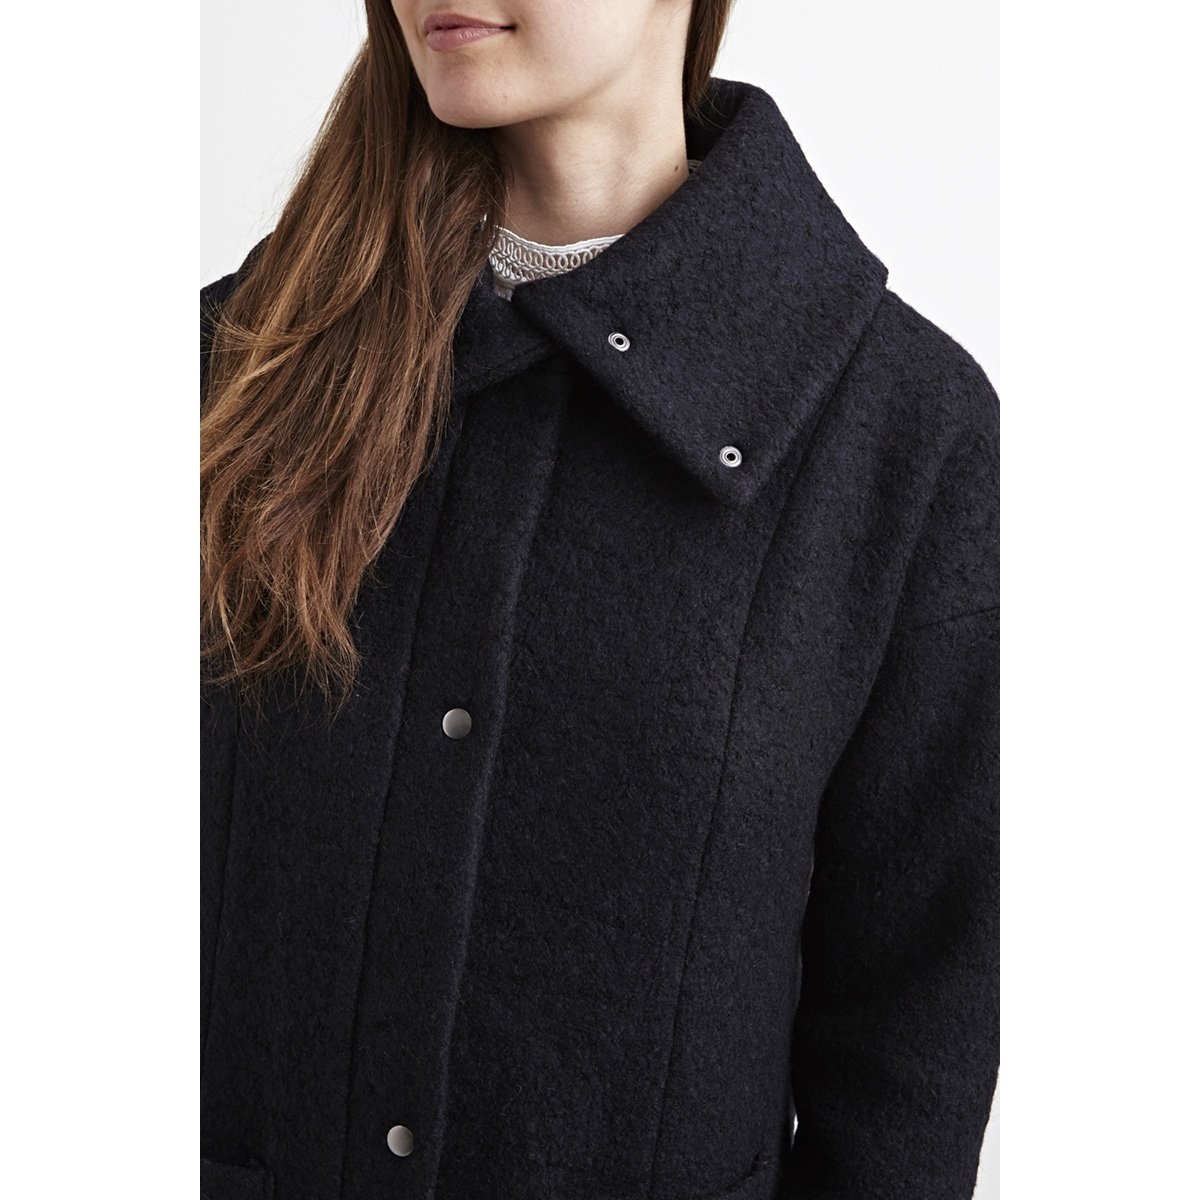 objmolly maris coat 92 23024790 object jas black